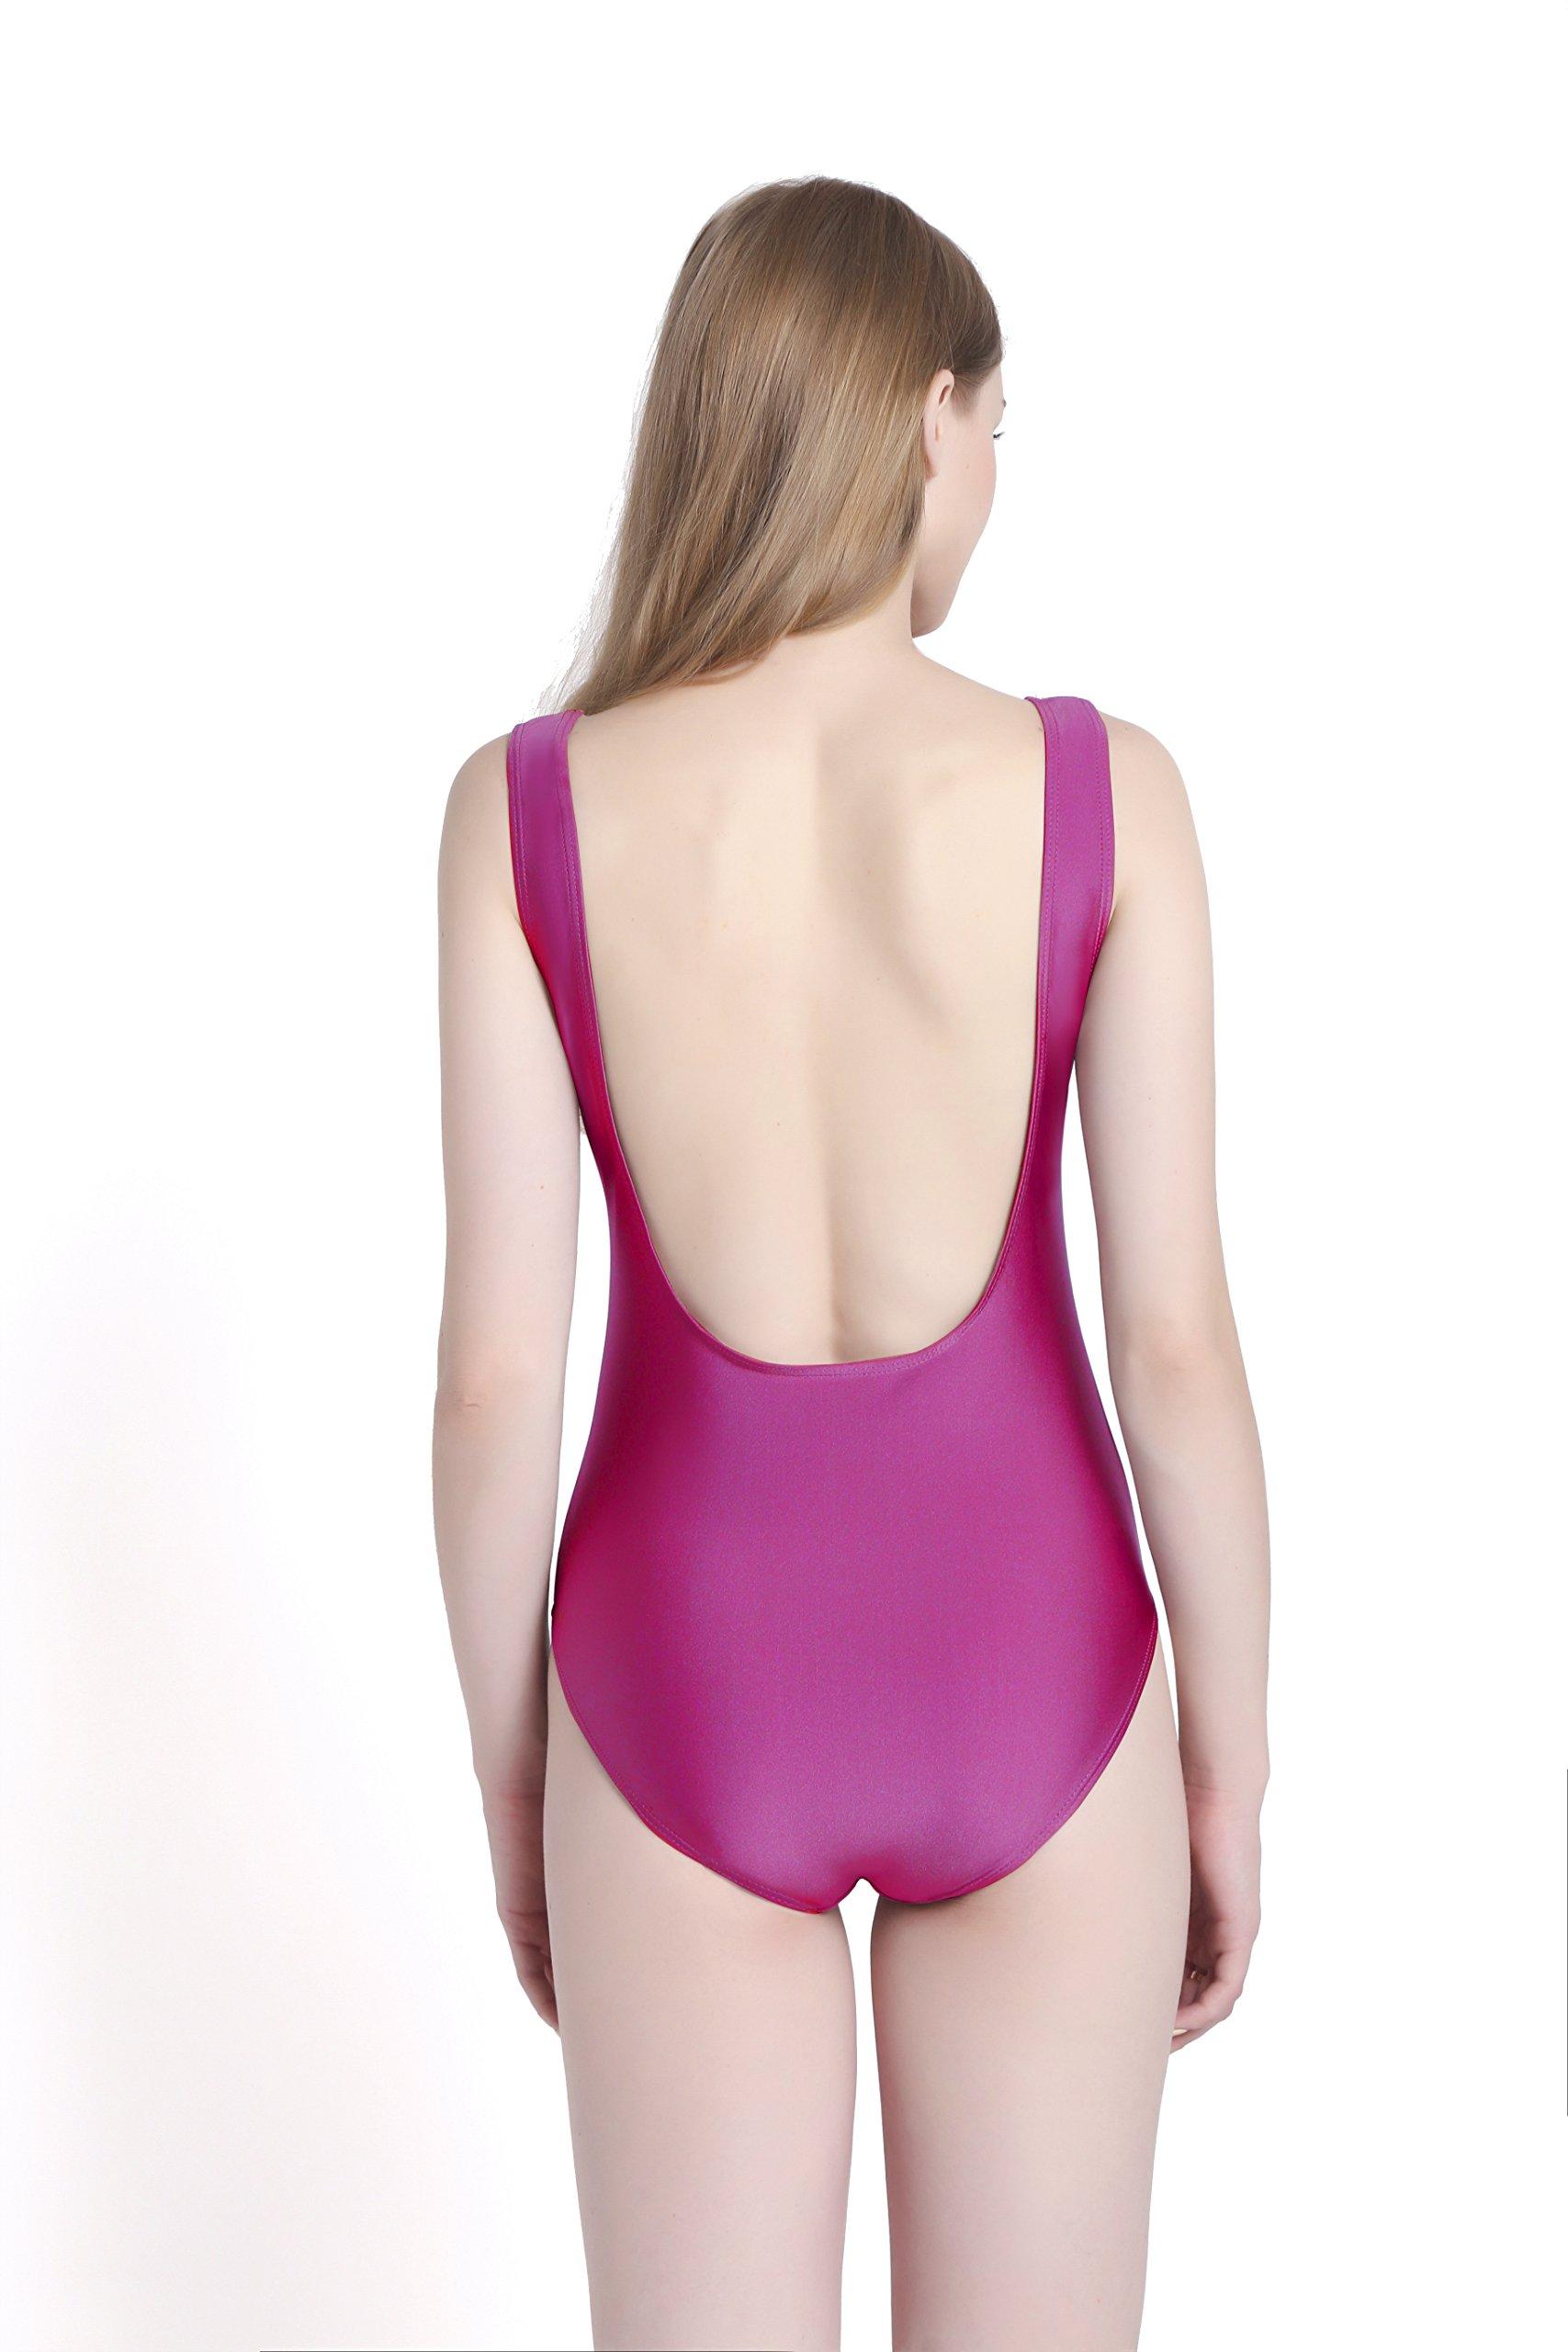 PINJIA Sexy Cute One Piece Swimsuit With High Cut and Low Back Monokini Bikini For Women(MX03) (S, Purple Bride)